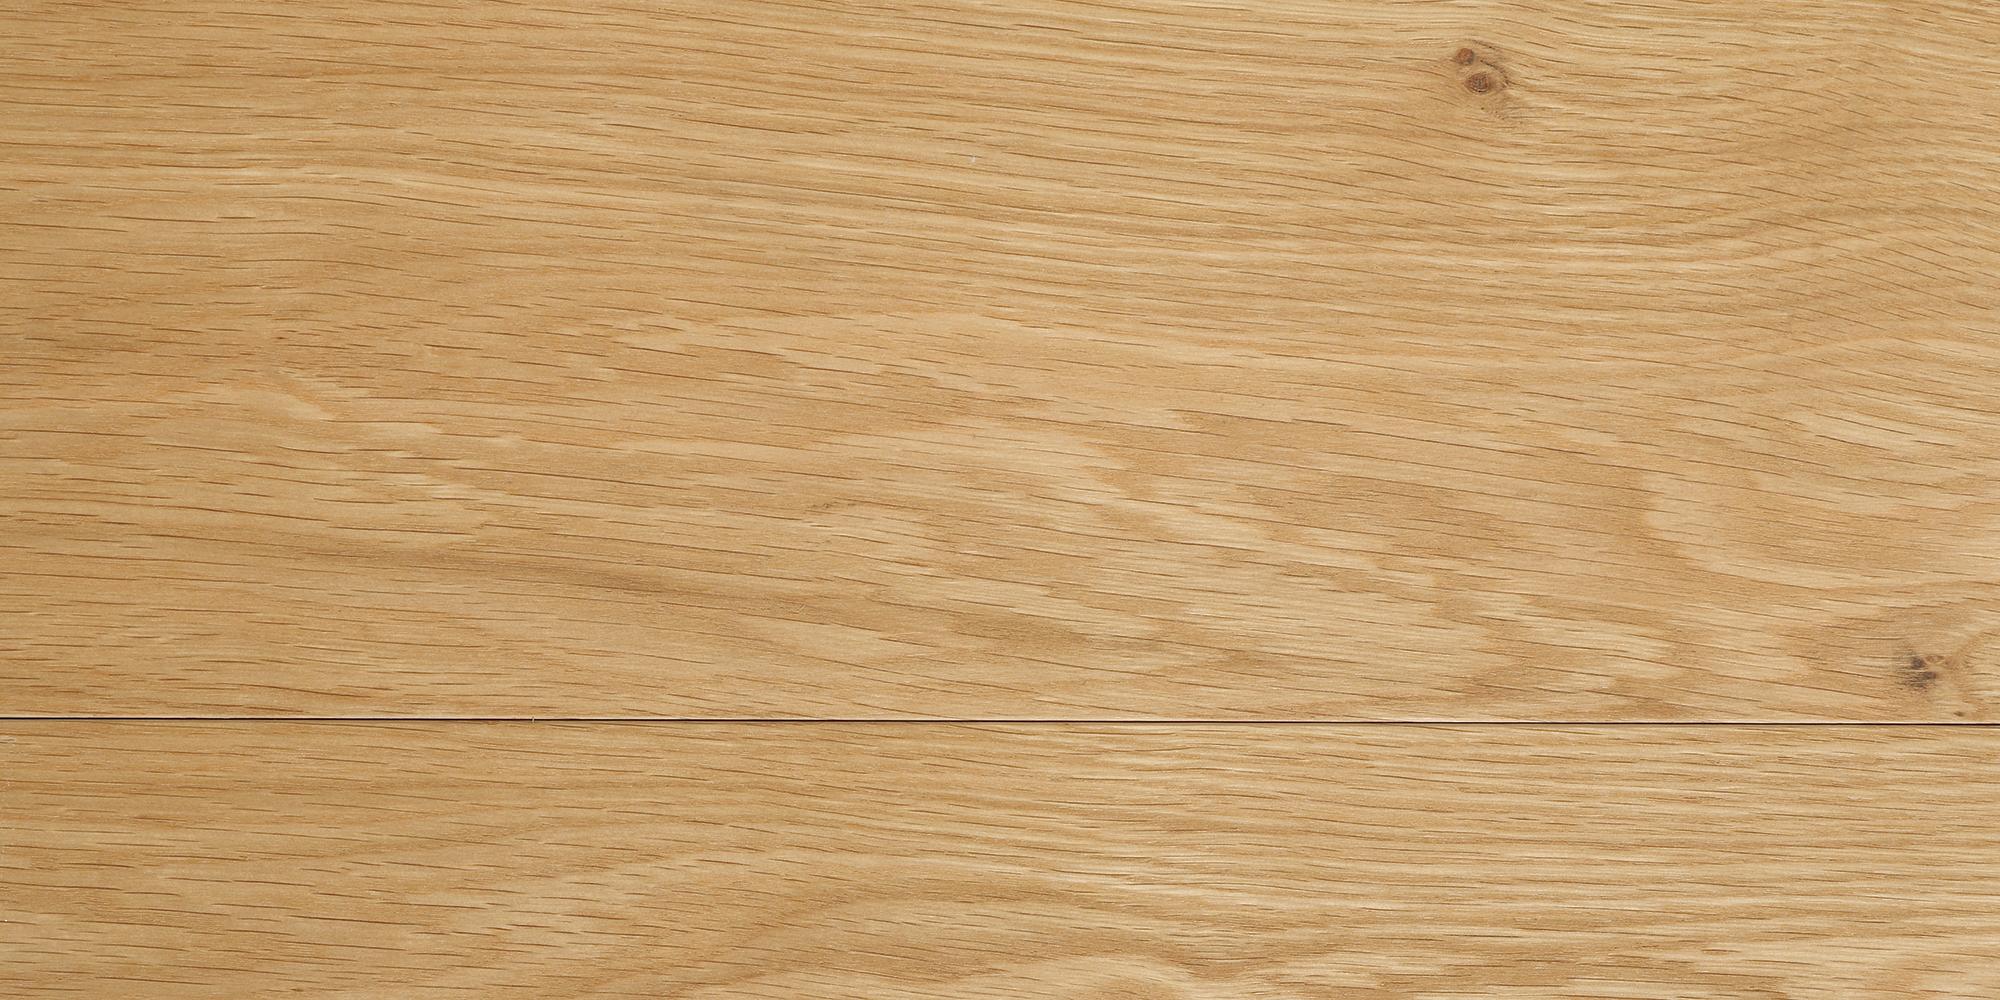 Oak Lumber Grading ~ Wood flooring grades explained woodpecker